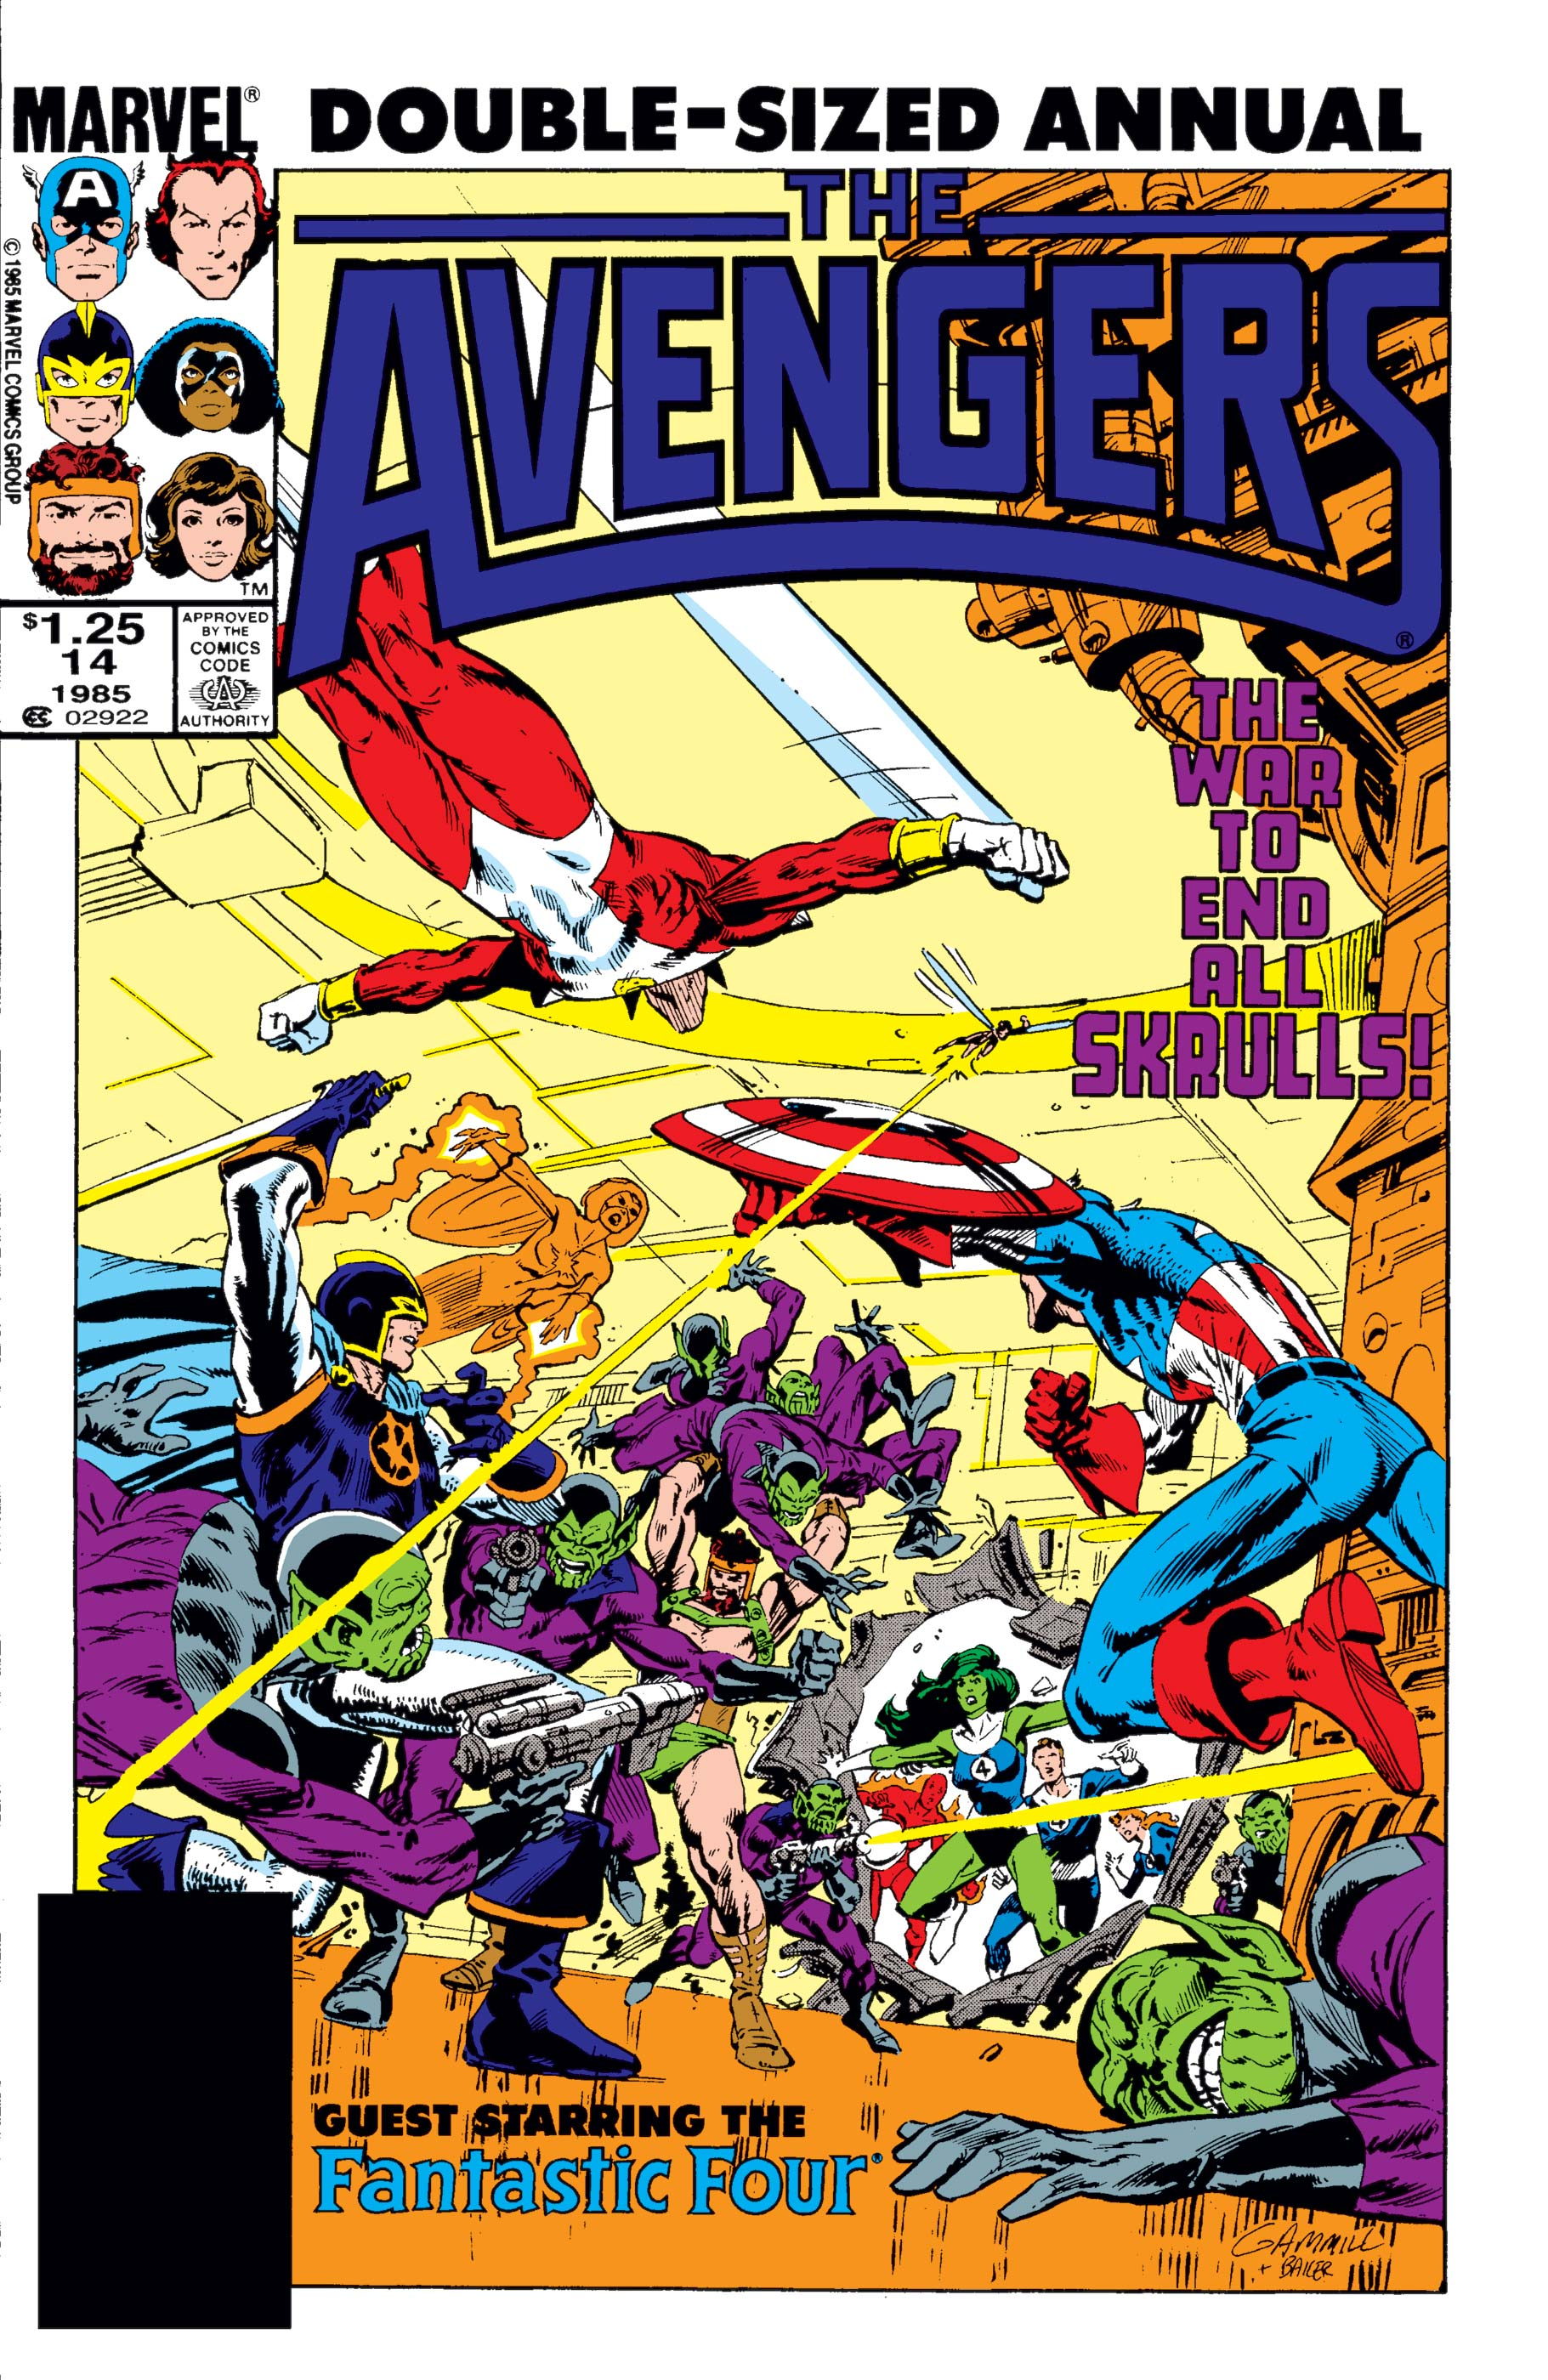 Avengers Annual (1967) #14